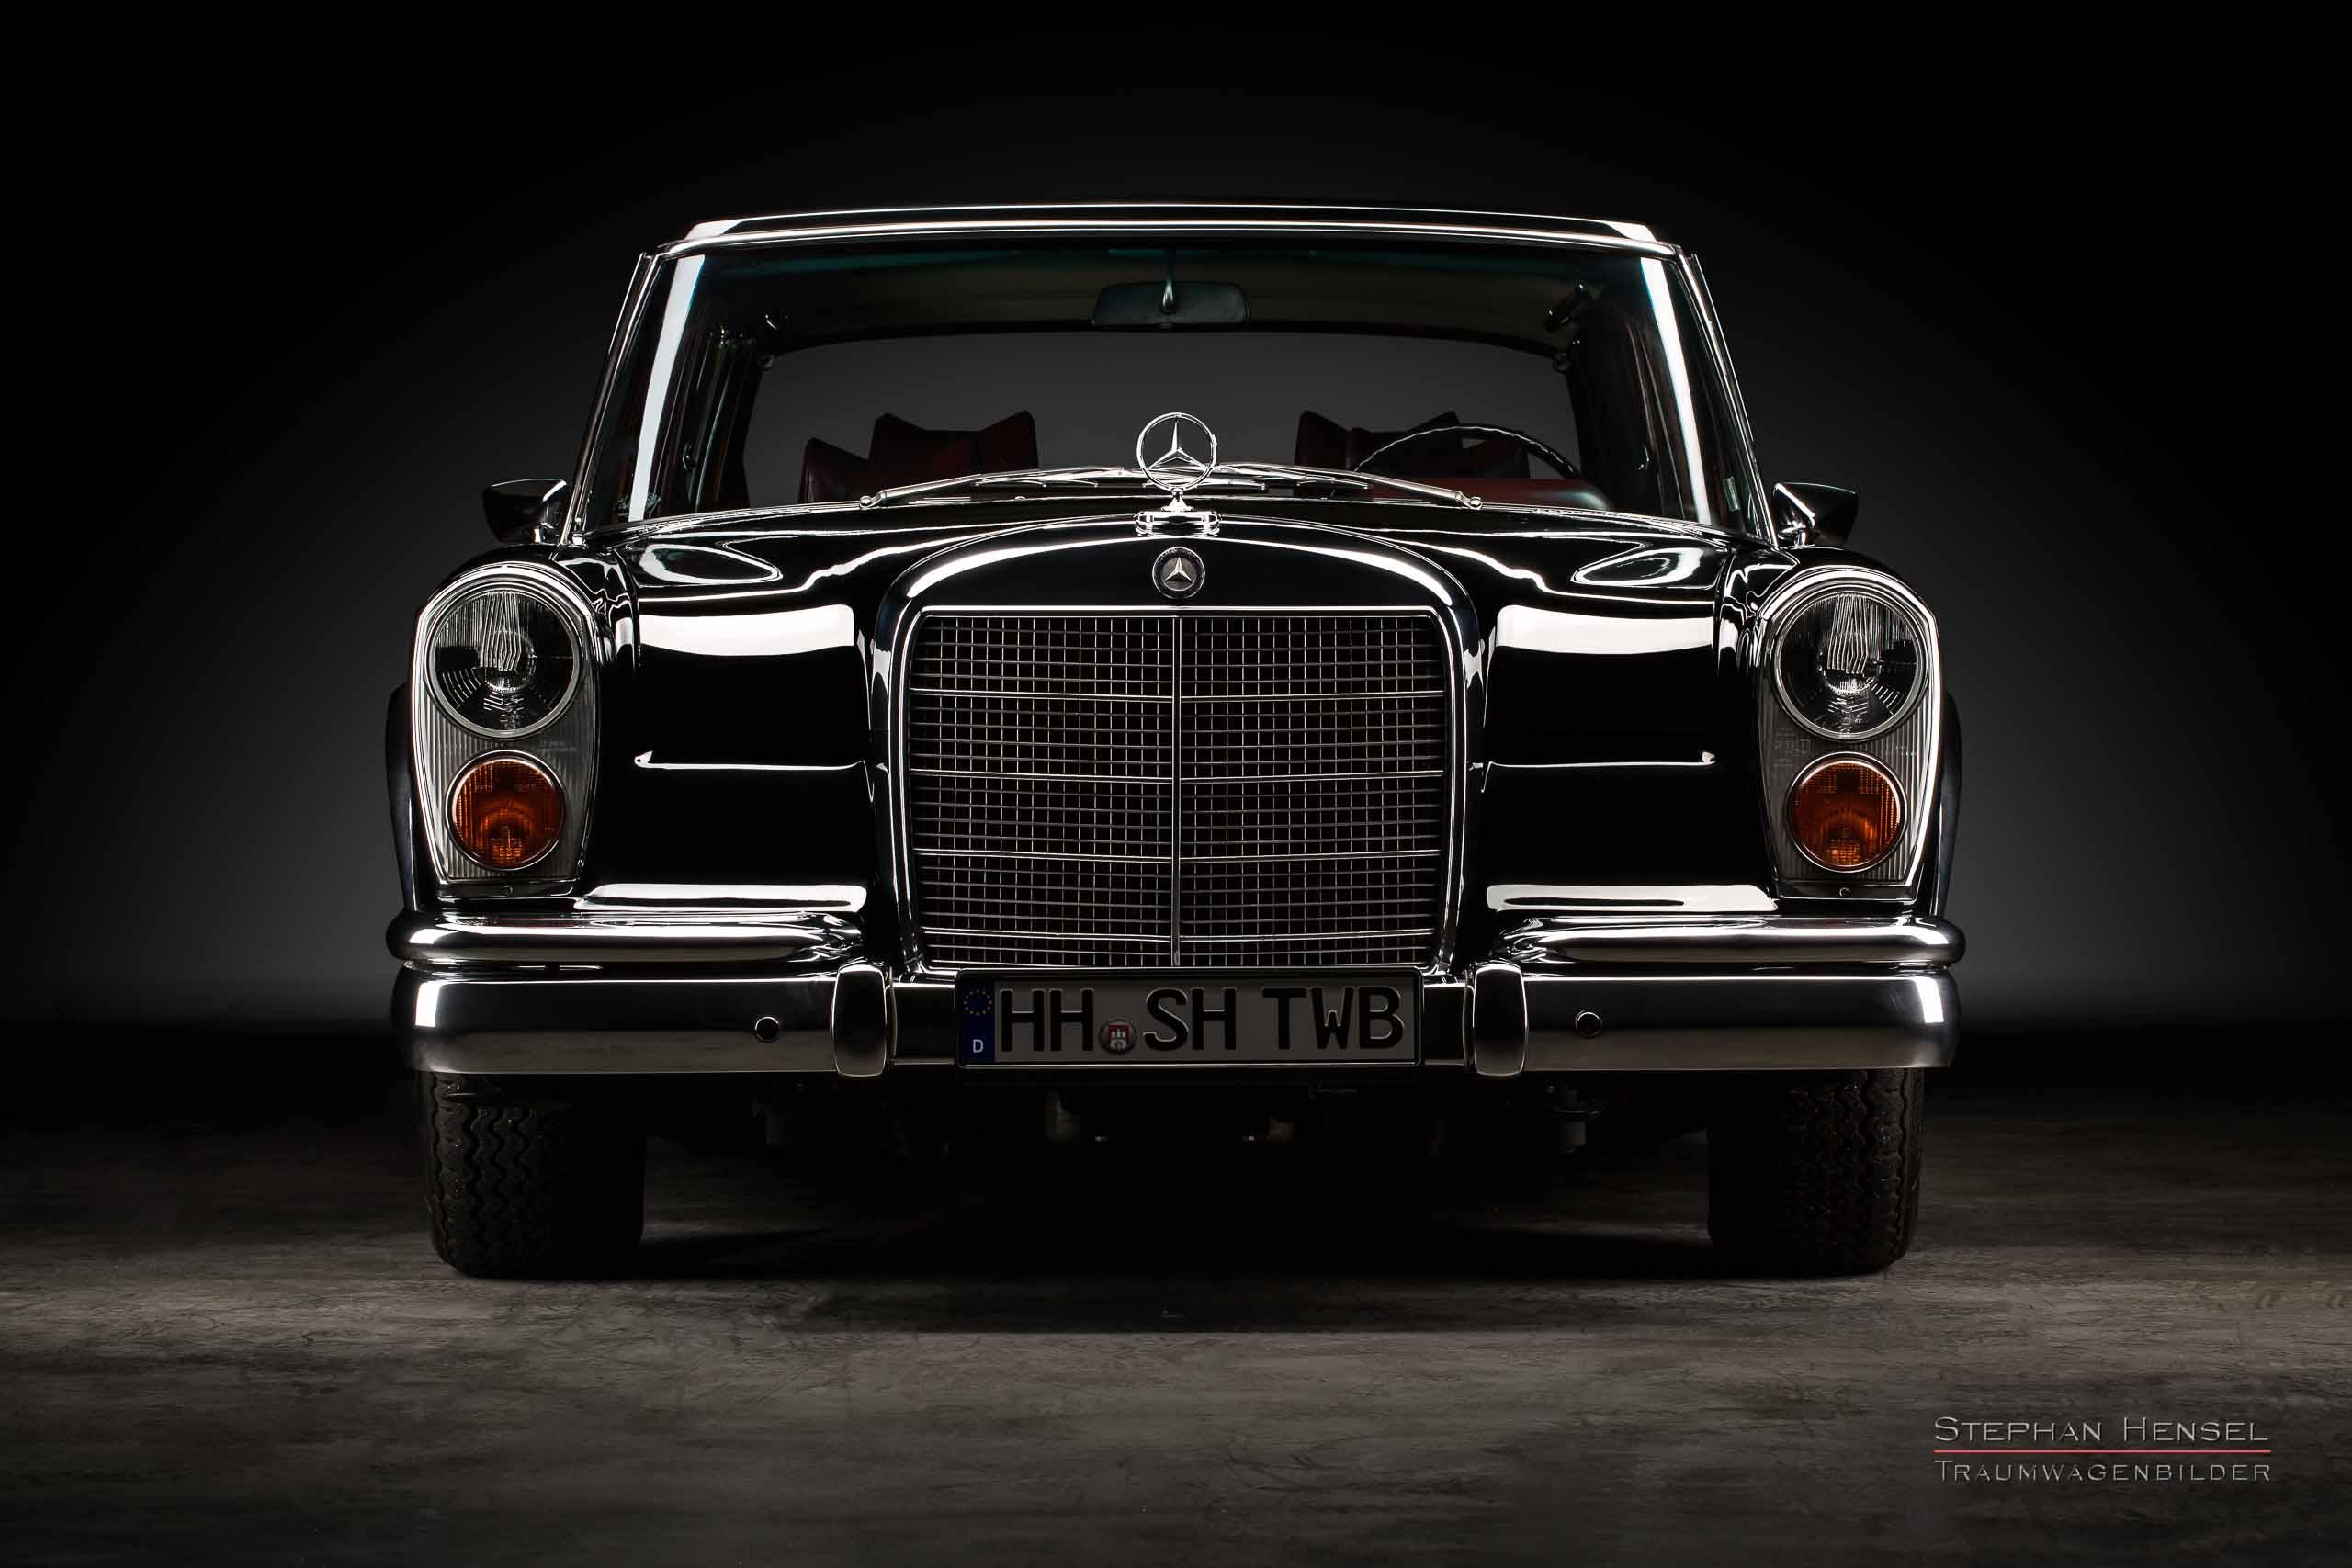 Mercedes-Benz 600, Mercedes 600, Staatskarosse, Autofotografie: Stephan Hensel, Hamburg, Oldtimerfotograf, Autofotograf, Automobilfotograf, Oldtimerfotografie, Autofotografen